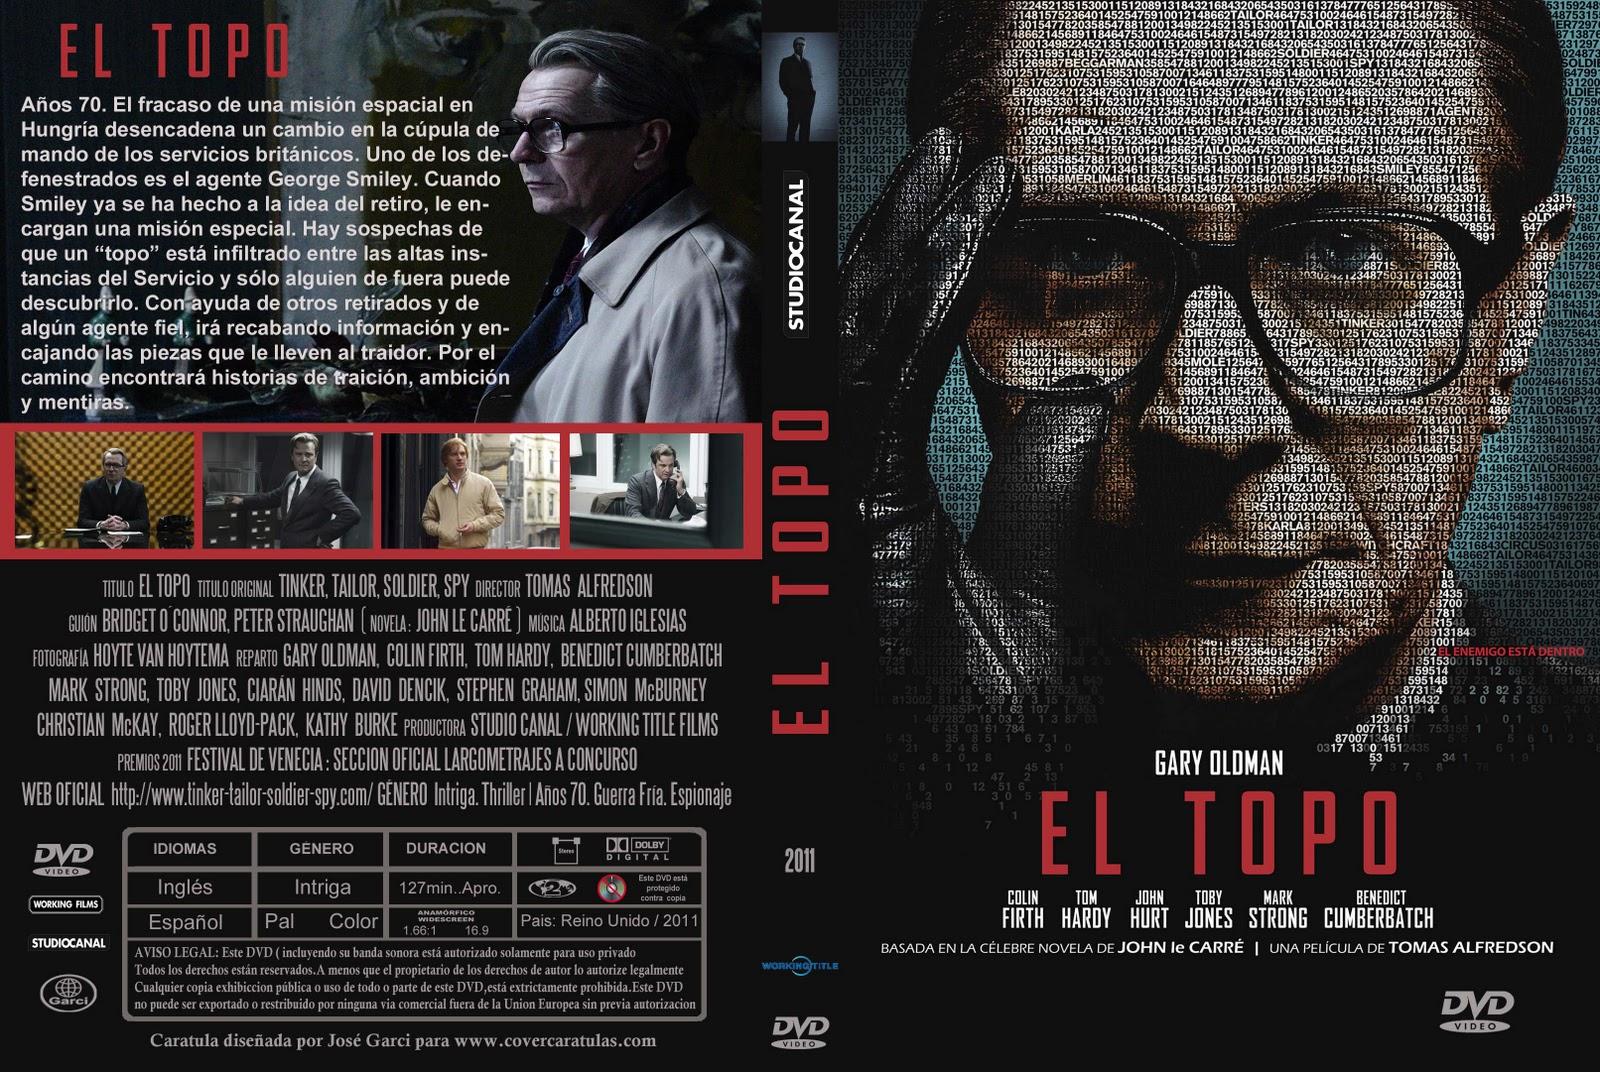 http://1.bp.blogspot.com/-NSsIyKmGDfs/Tw-xD_noqRI/AAAAAAAABKM/6kRTczLtQcw/s1600/El_Topo_-_2011_-_Custom_por_Josegarci.jpg